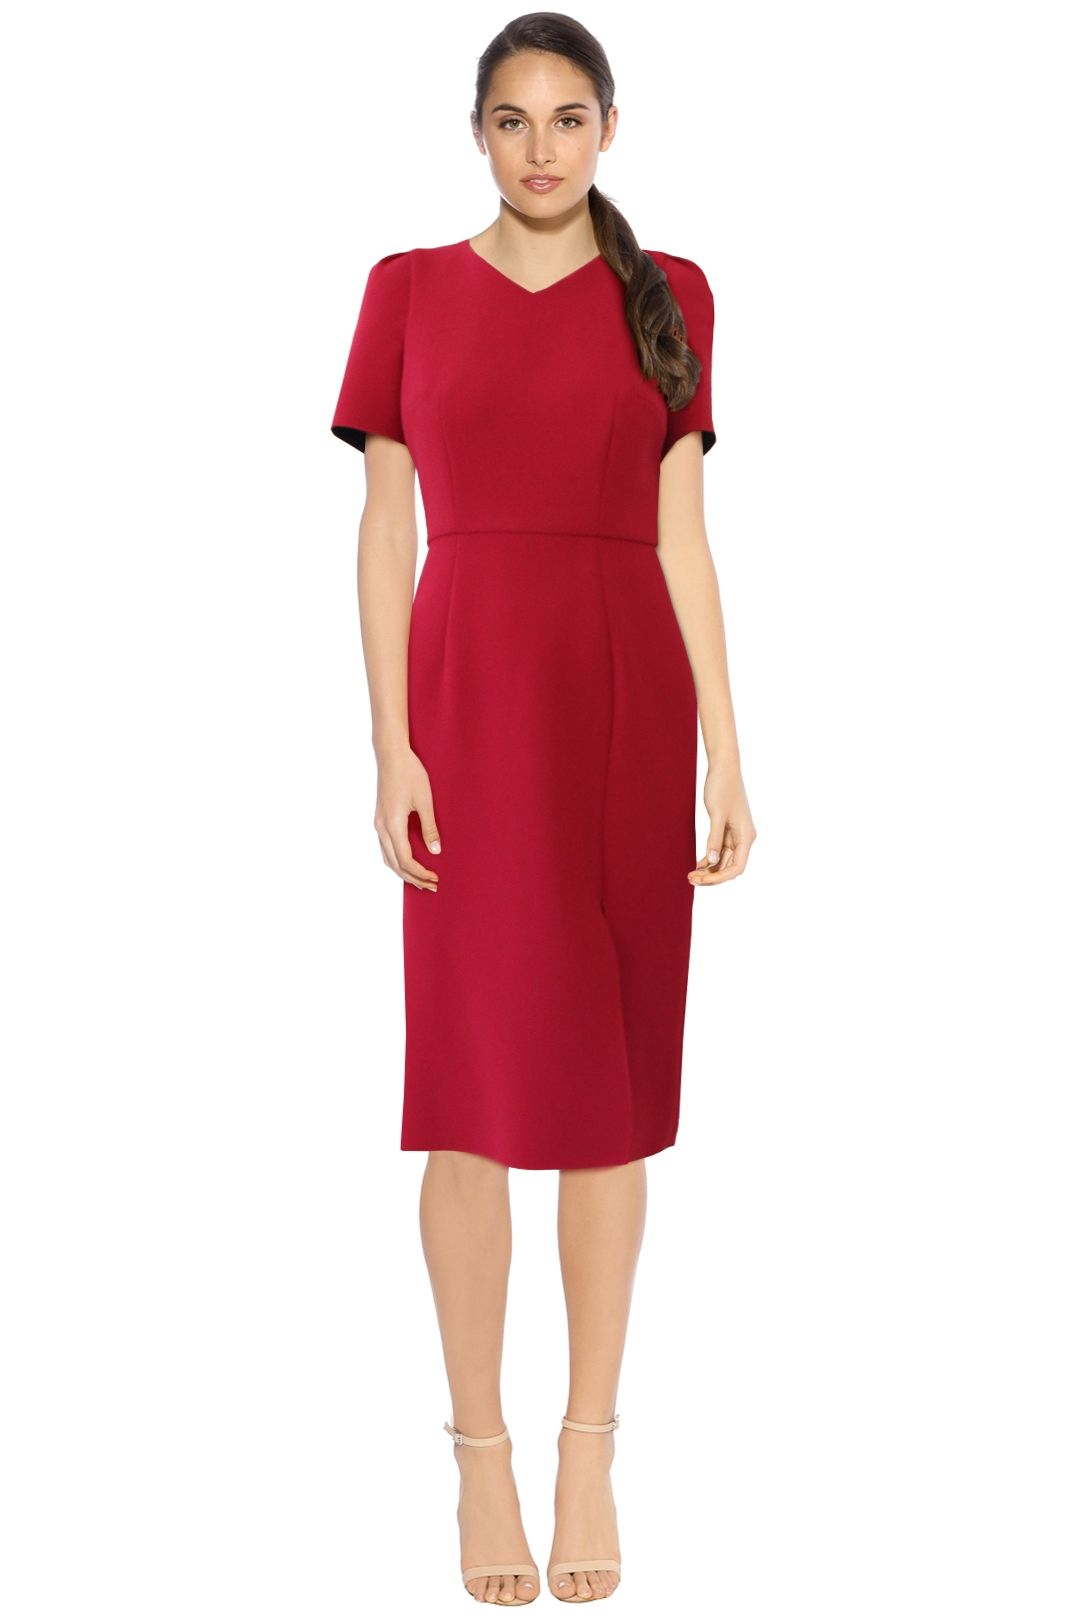 Yeojin Bae - Kristy Dress - Fuschia - Front